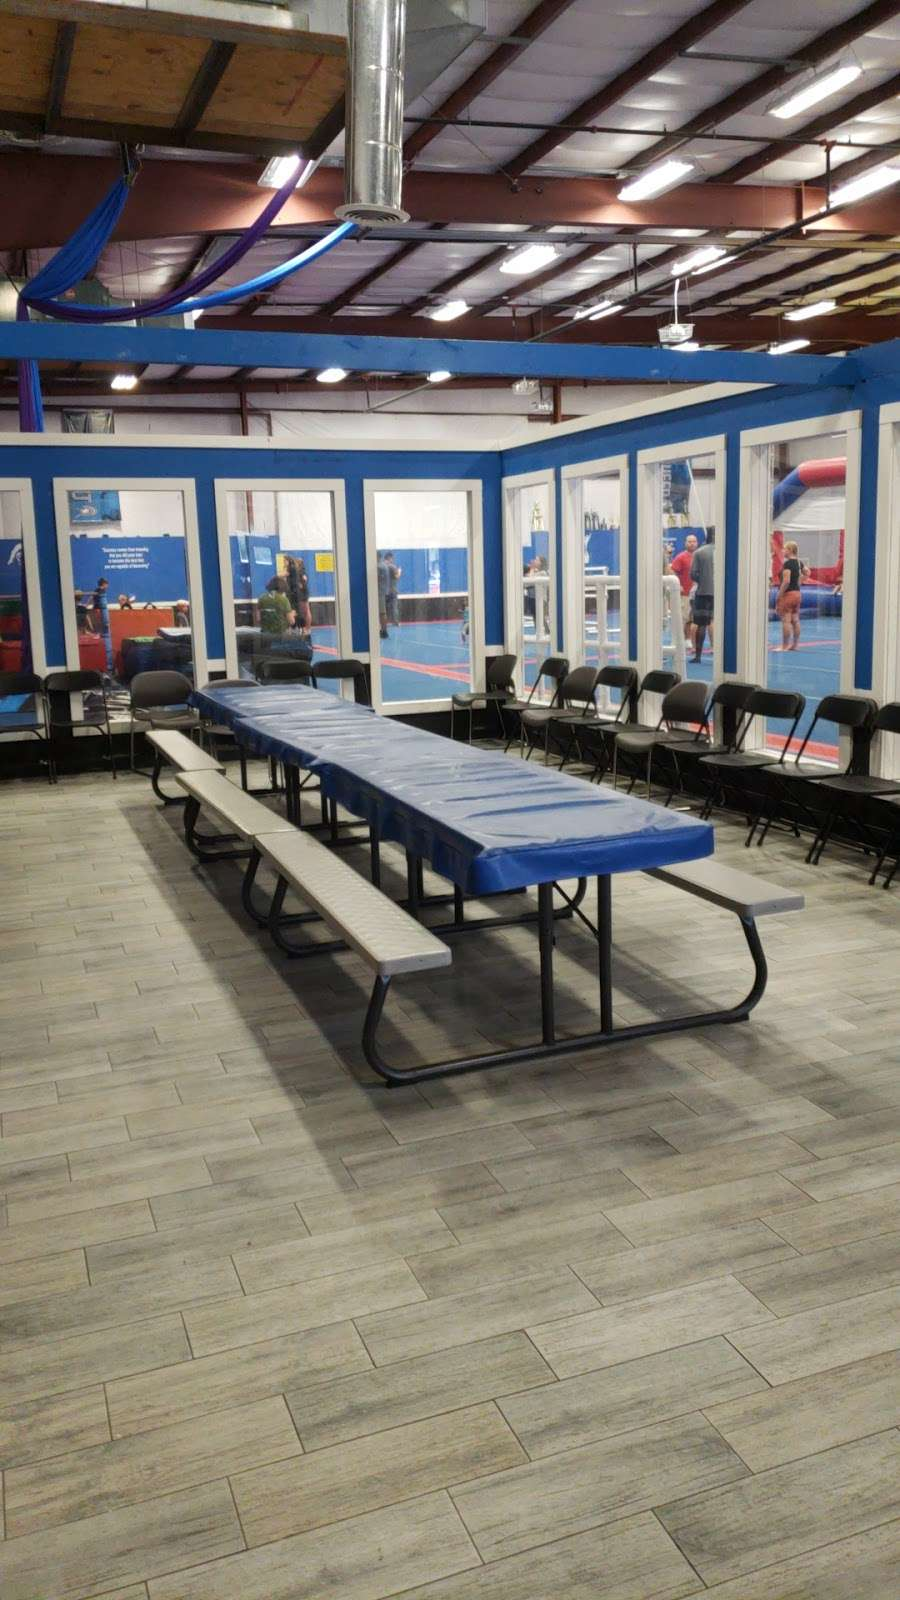 Double Down Athletics - gym  | Photo 7 of 10 | Address: 1551 Swanson Dr, Oviedo, FL 32765, USA | Phone: (407) 365-8021